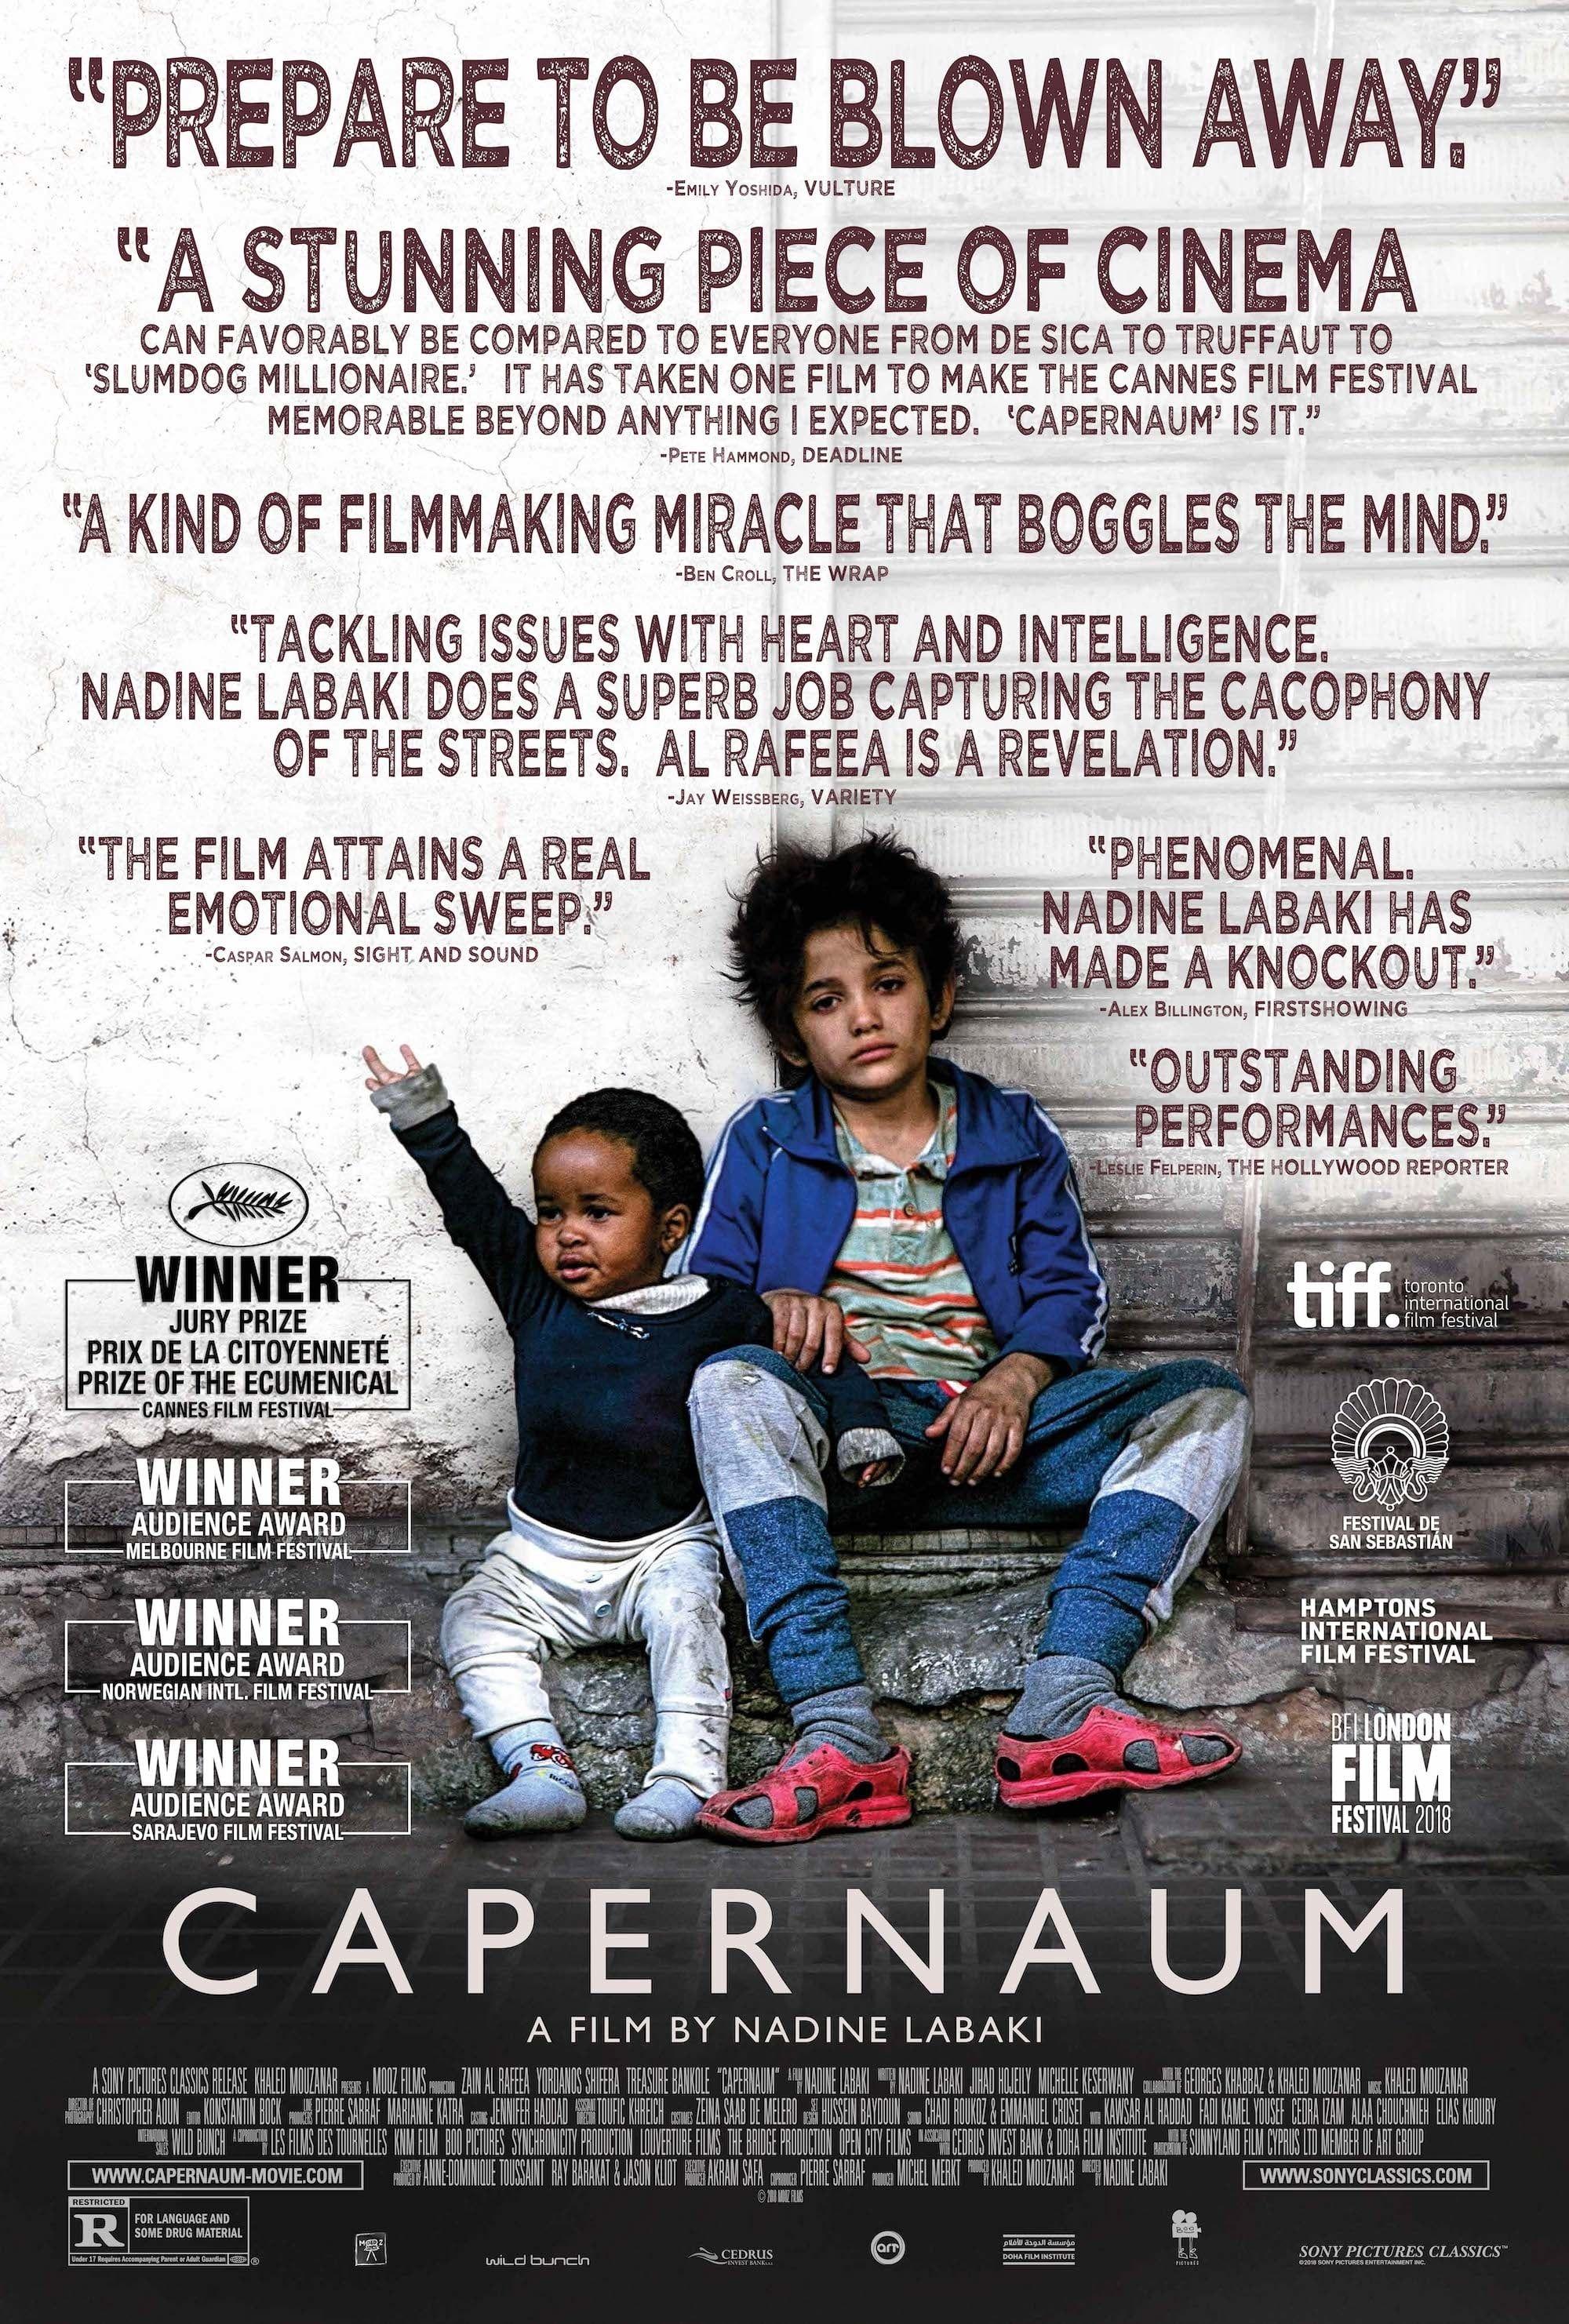 Capernaum فيلم كامل Capernaum Movie Fullmovie Streamingonline Movies Streaming Movies Full Movies Free Movies Online